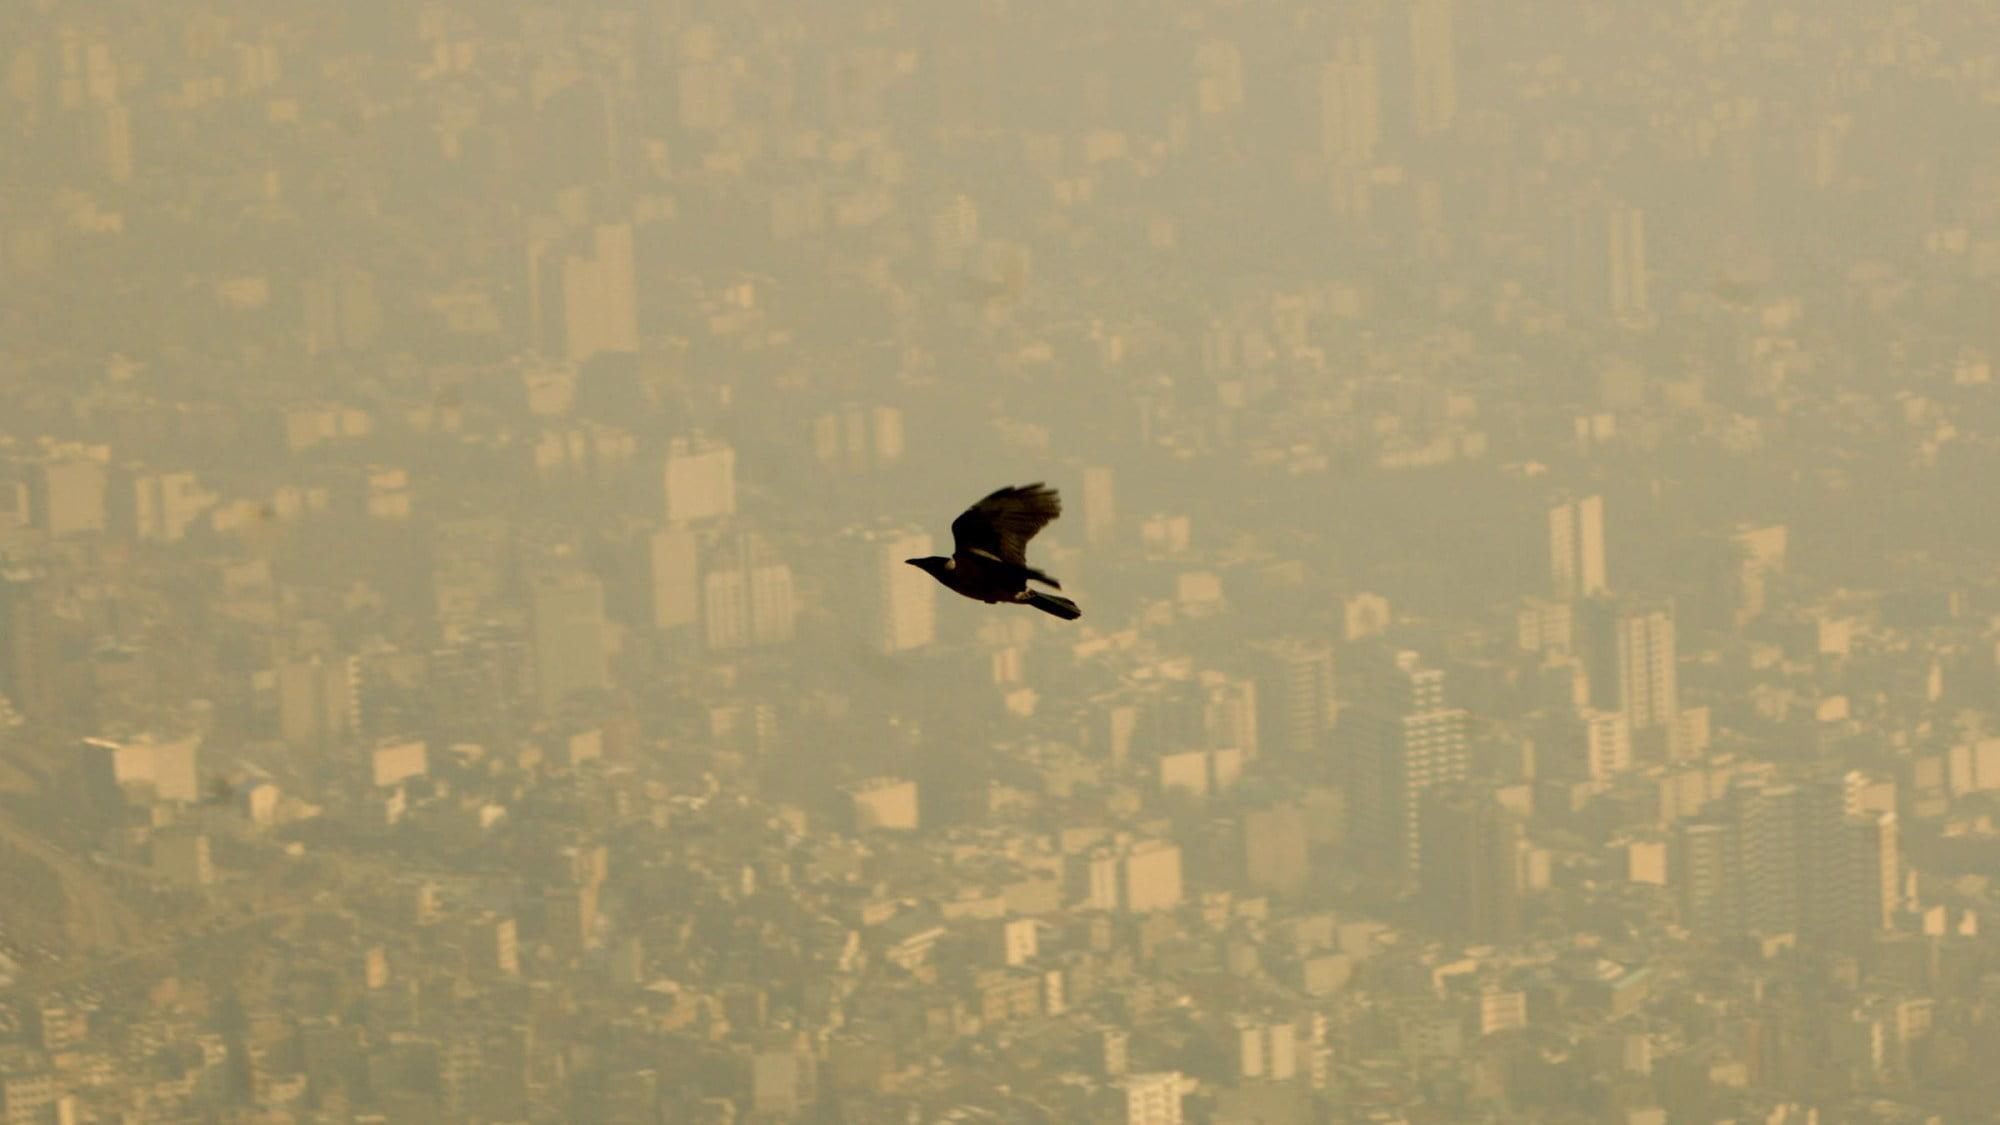 Pollution in Iran